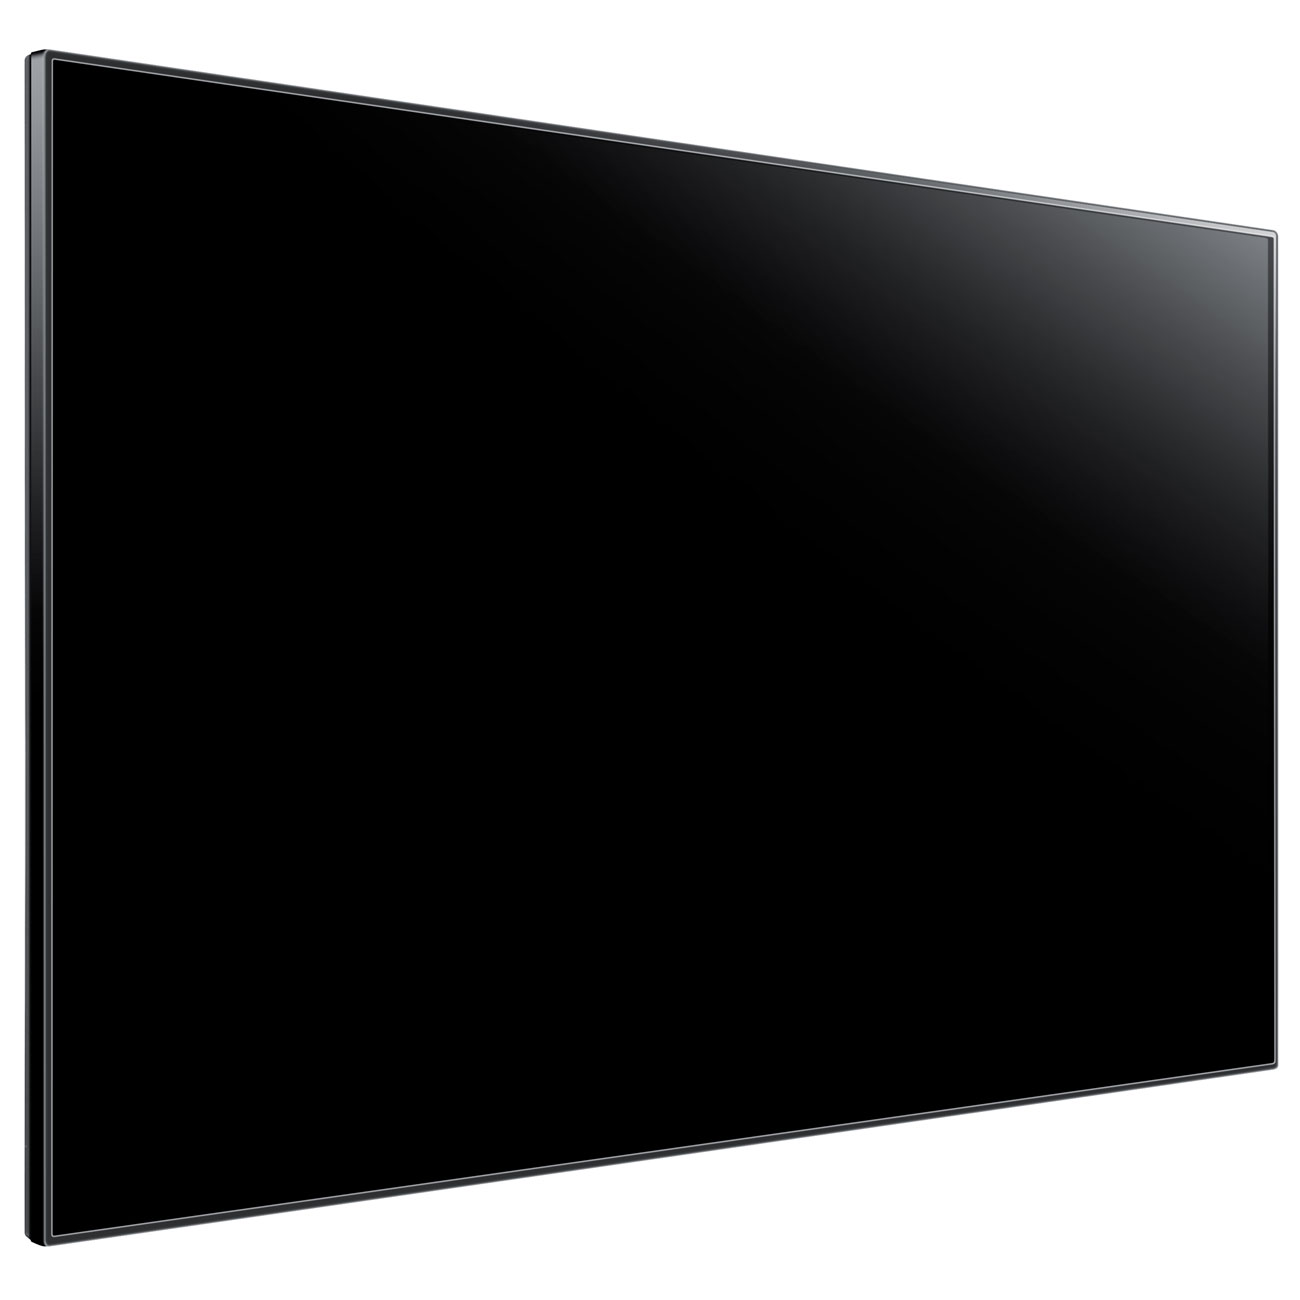 Samsung 55 led ue55a ecran dynamique samsung sur for Samsung photo ecran